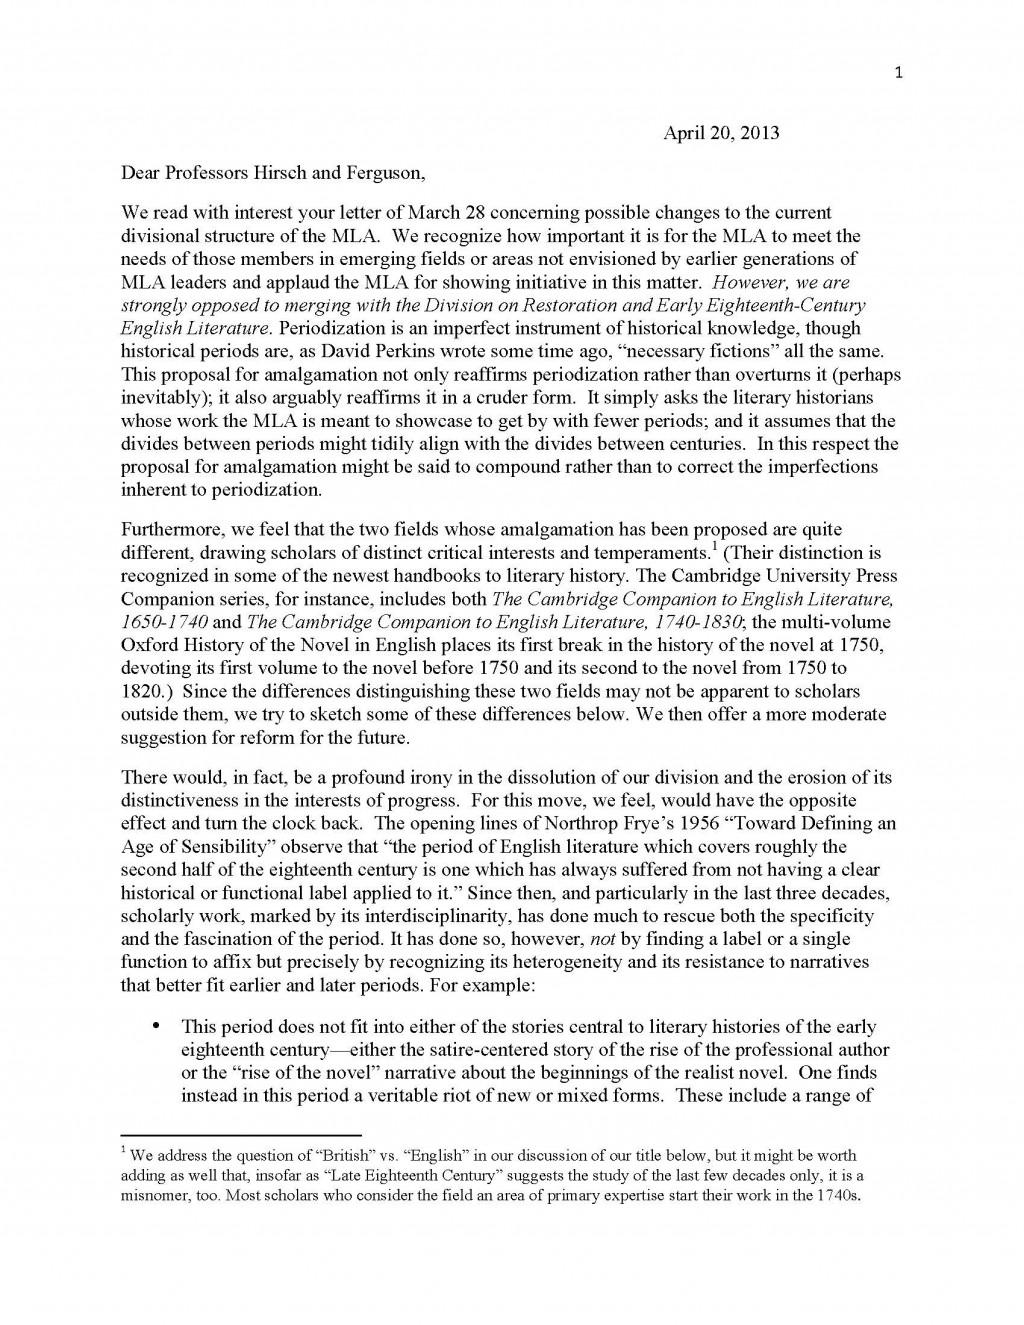 008 Essay Proposal Response To Marianne Hirsch Margaret Ferguson Rev Final Copy Page 1 Top Apa Format Example Samples Large